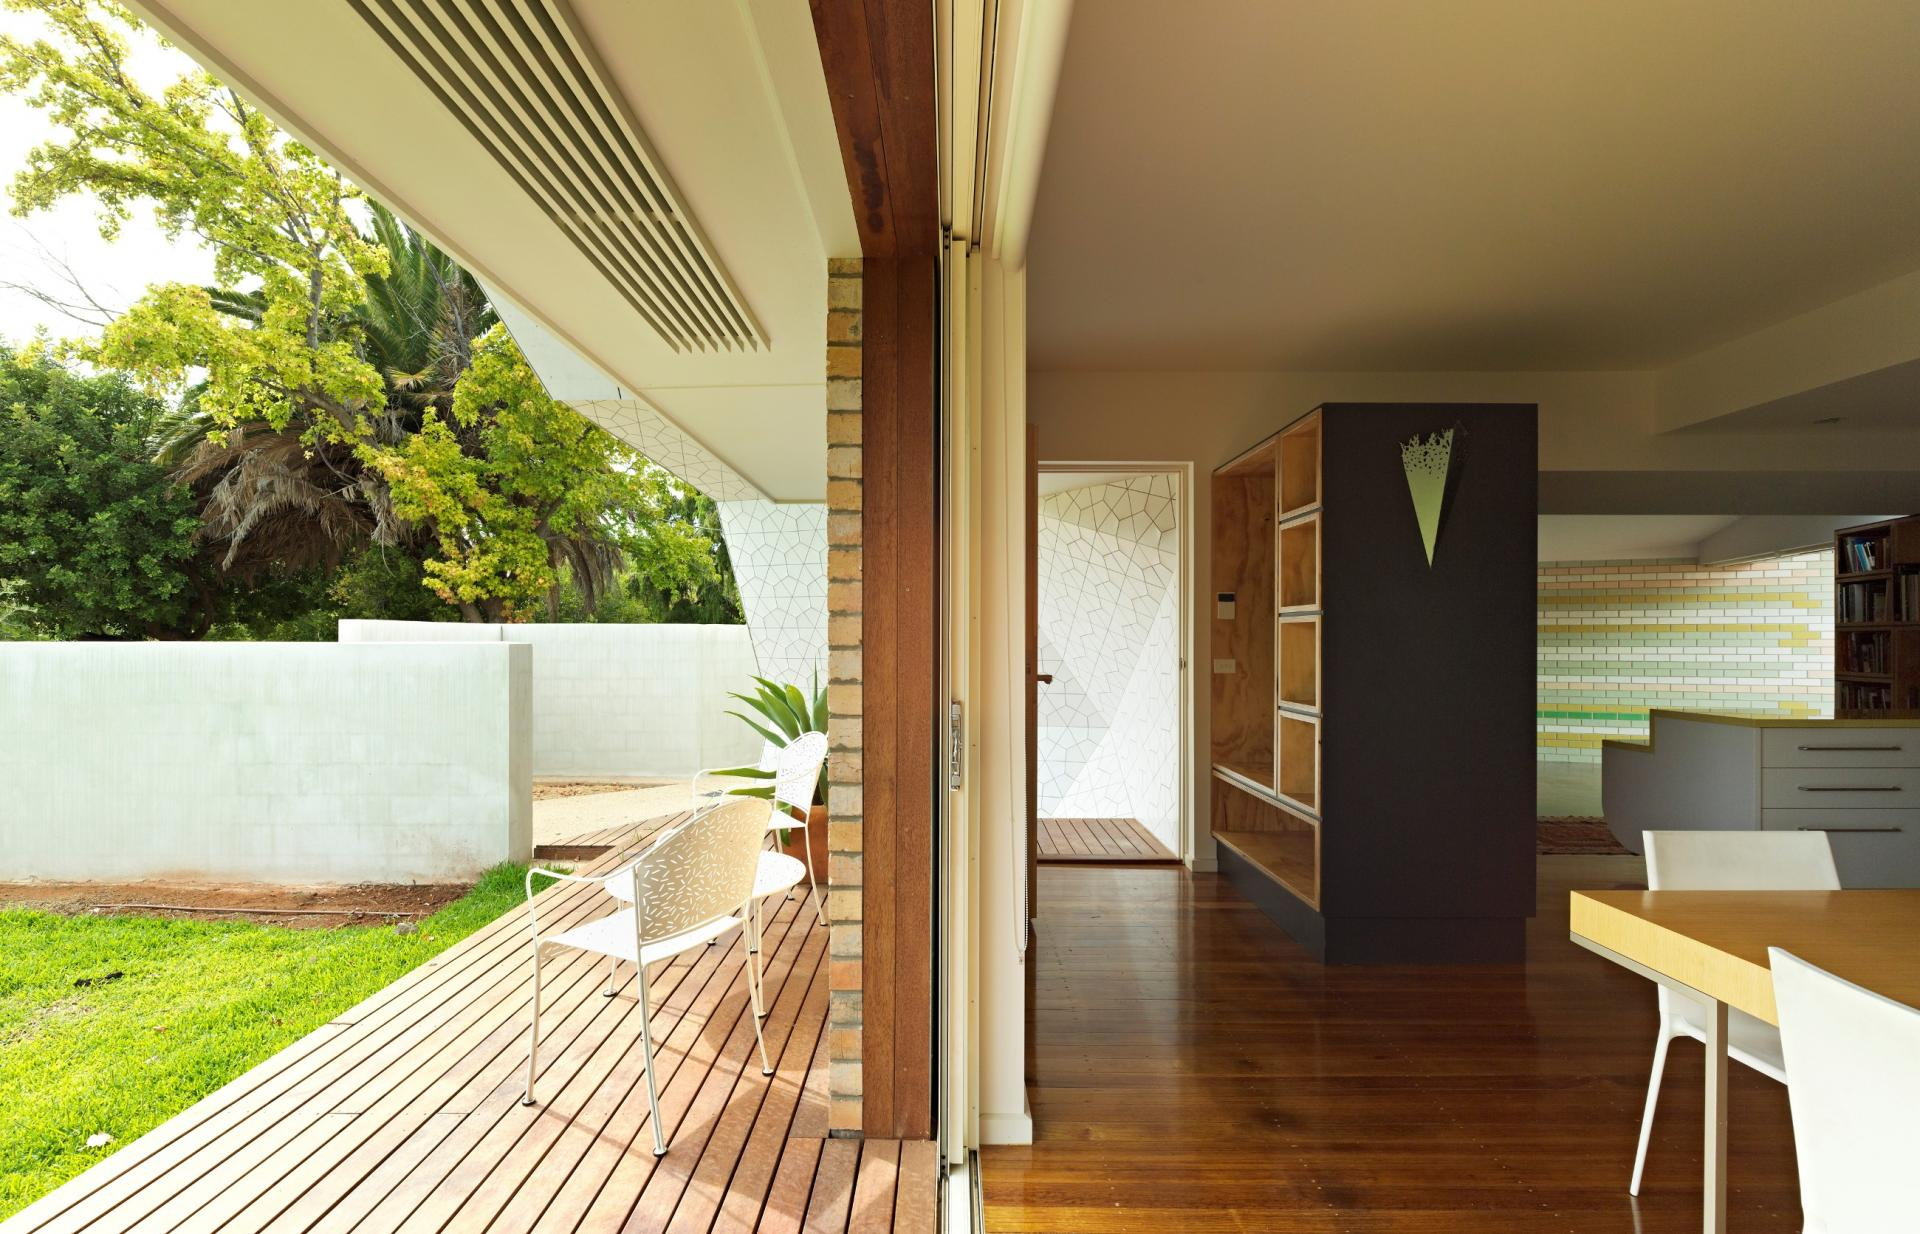 Wattle Avenue House by Minife van Schaik Architects (via Lunchbox Architect)